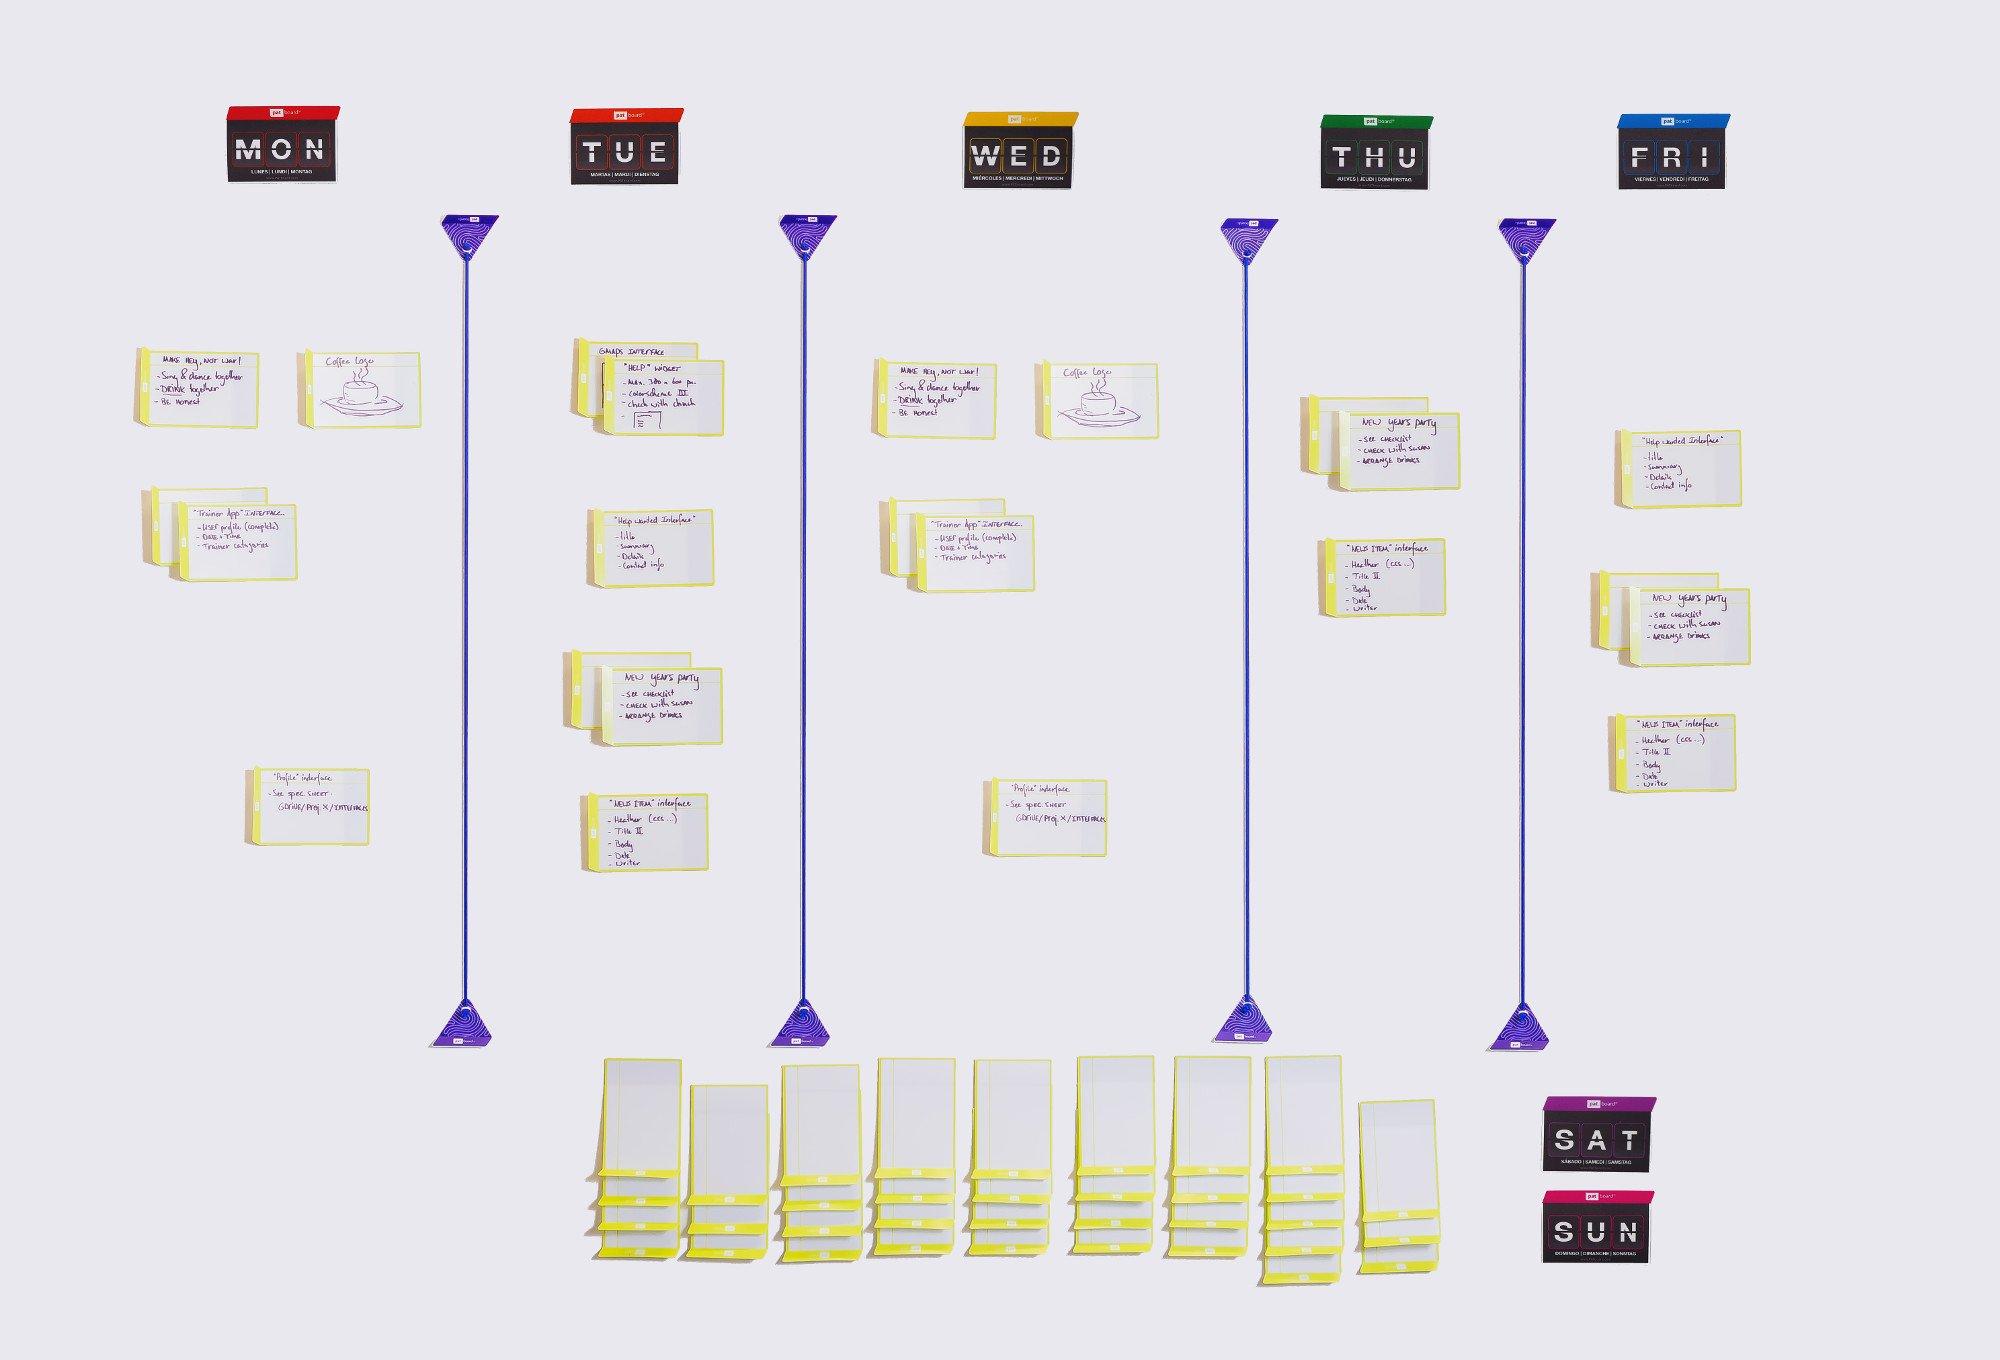 Agile weekly planner board set - basic